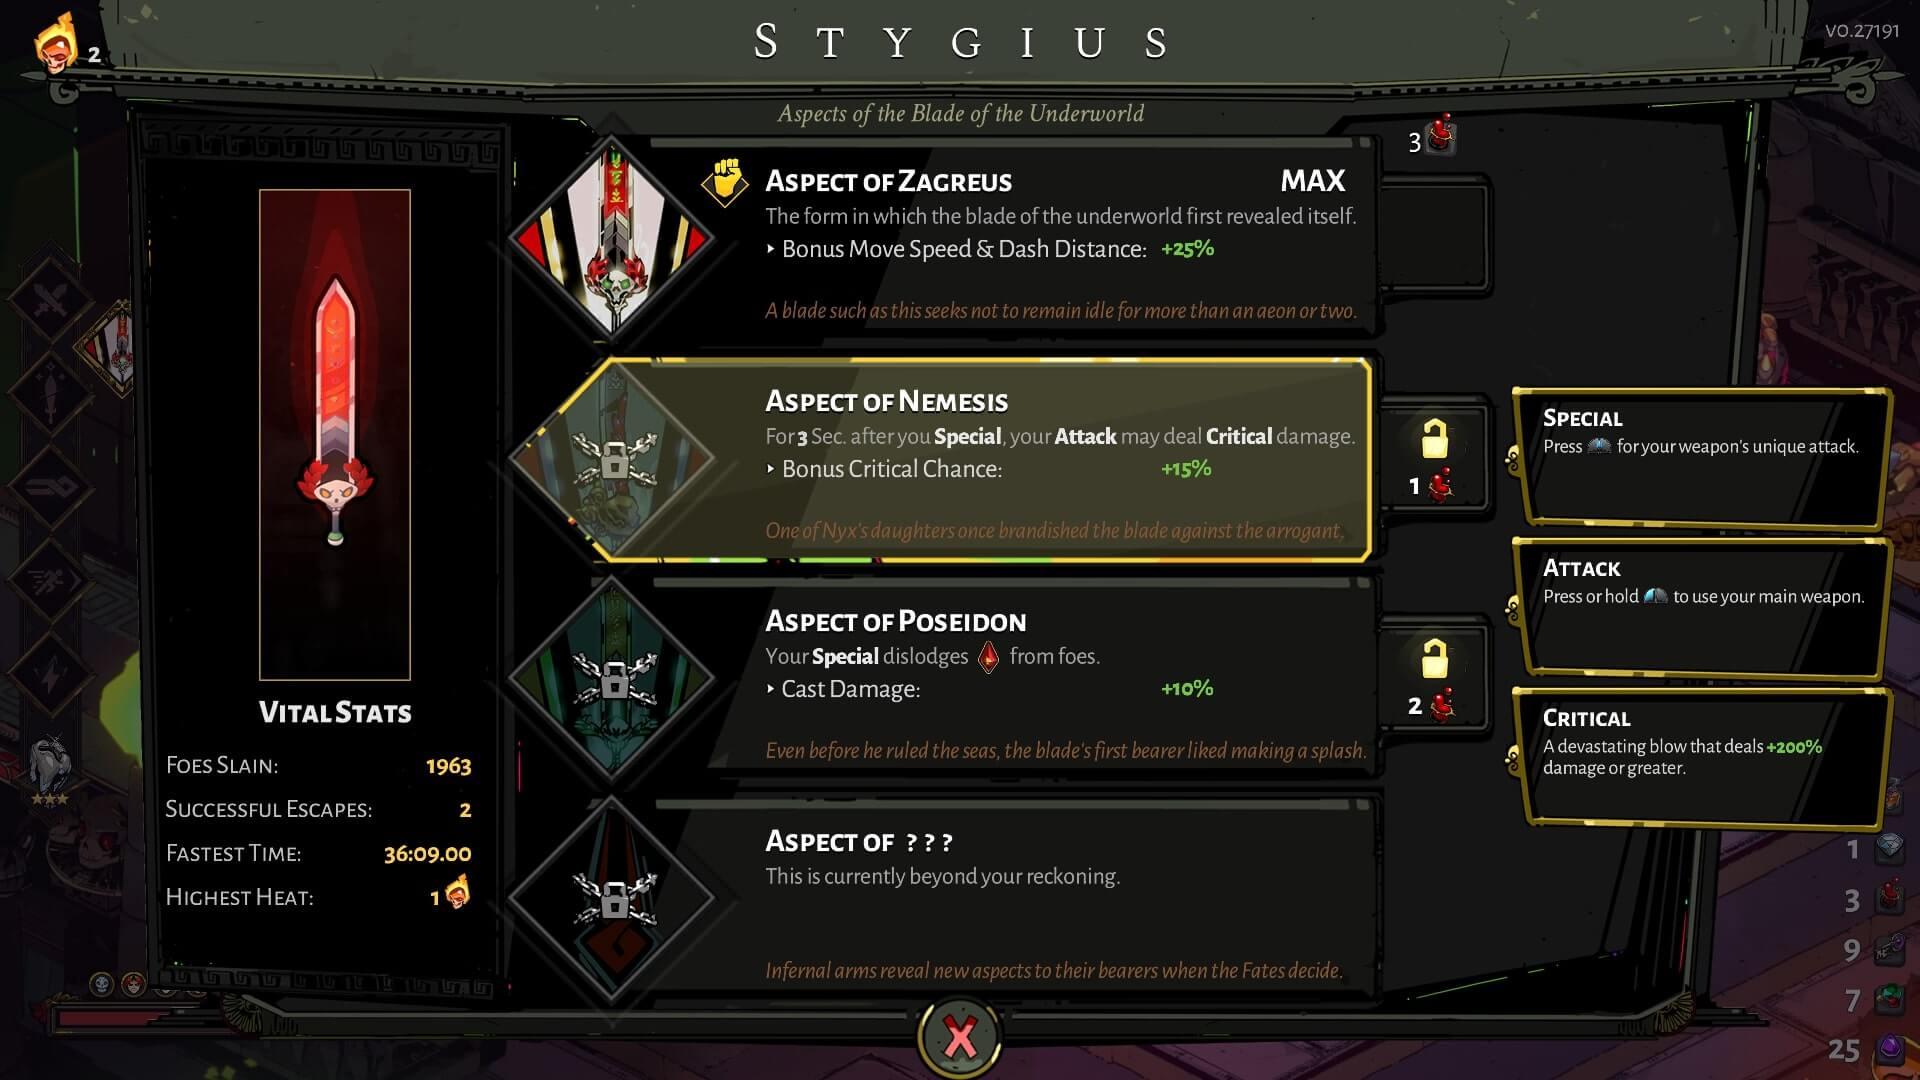 Stygius screenshot of Hades video game interface.